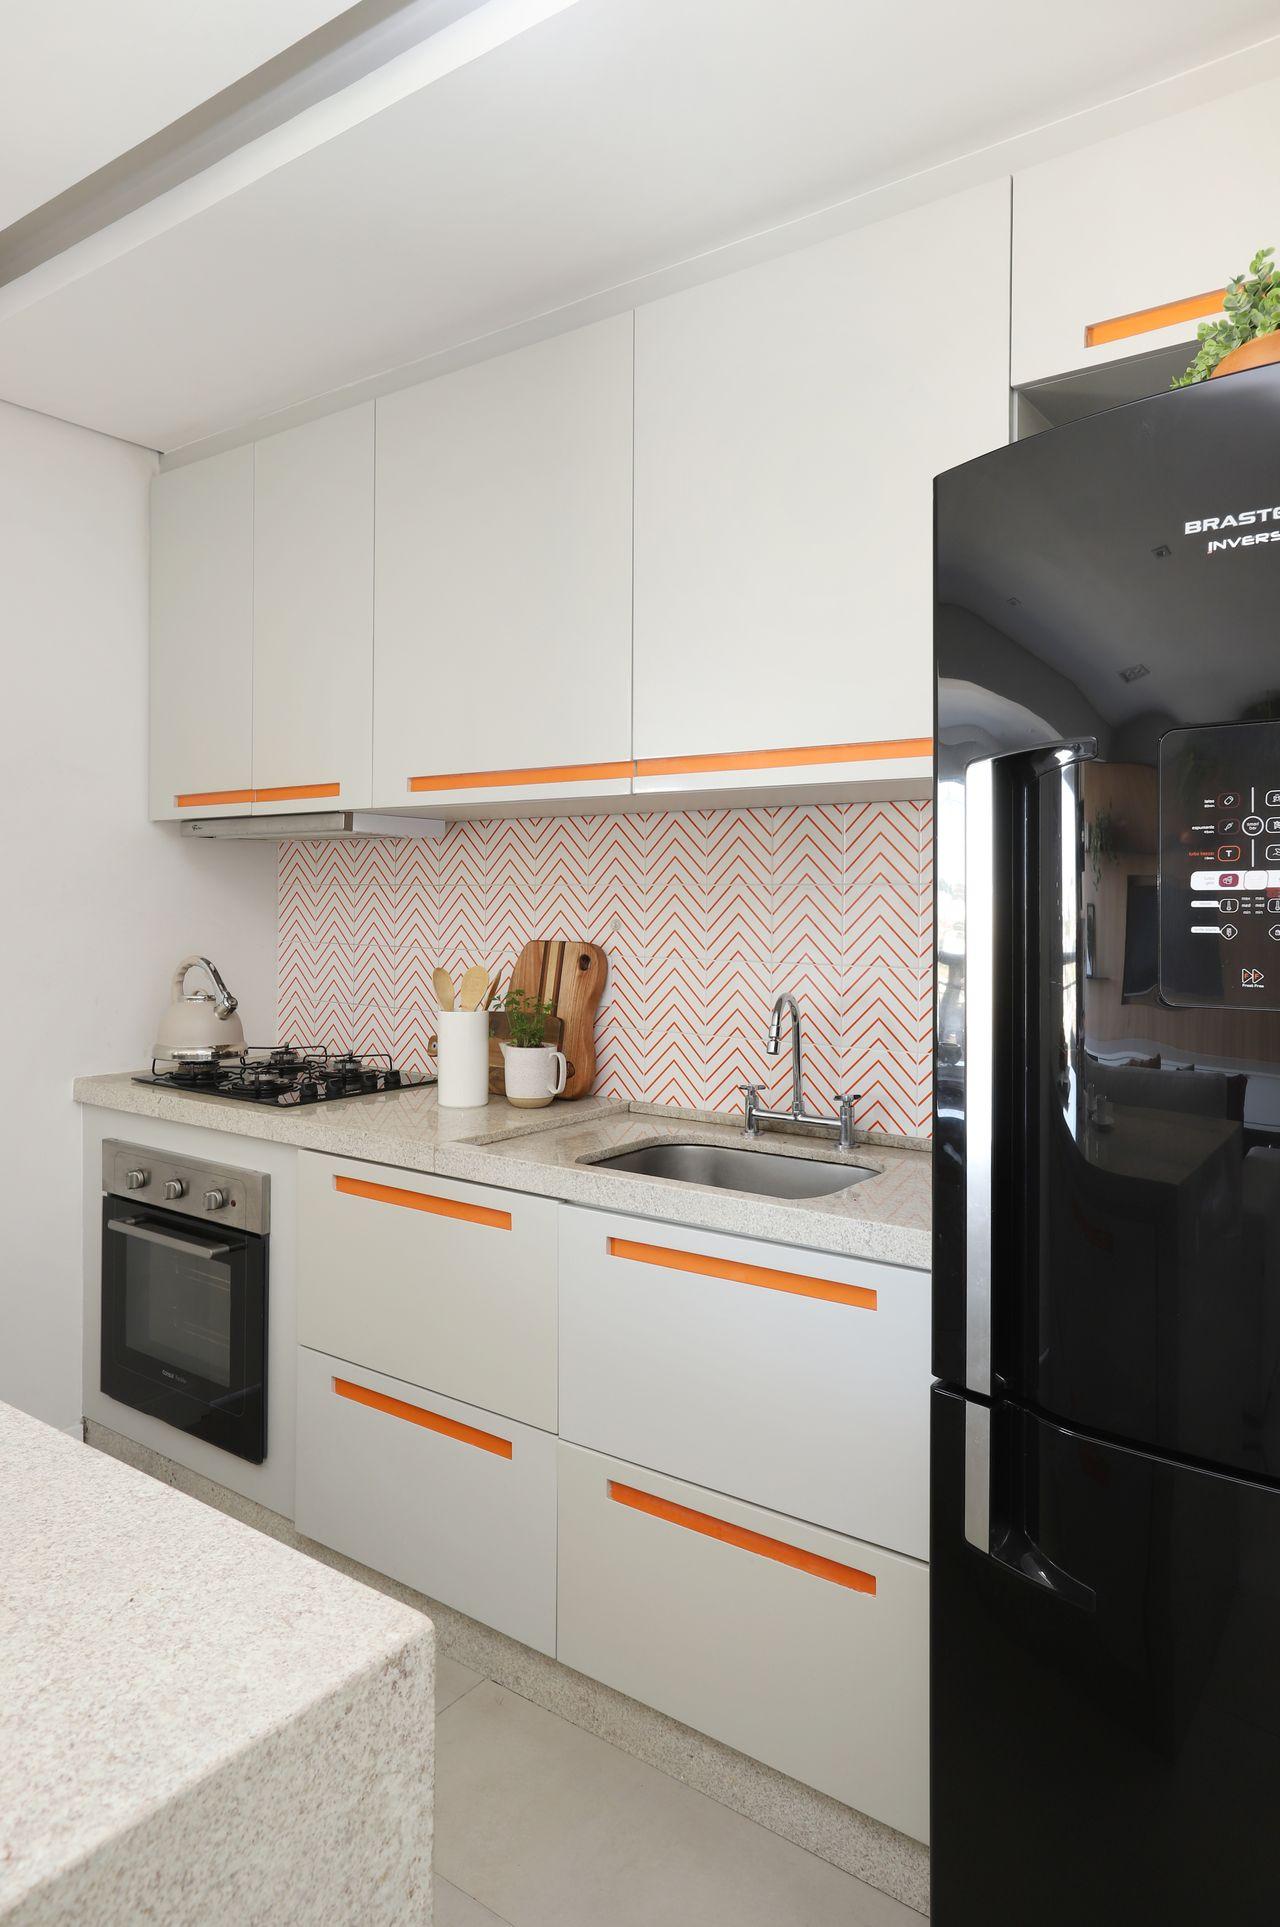 Environment with orange decor and black refrigerator